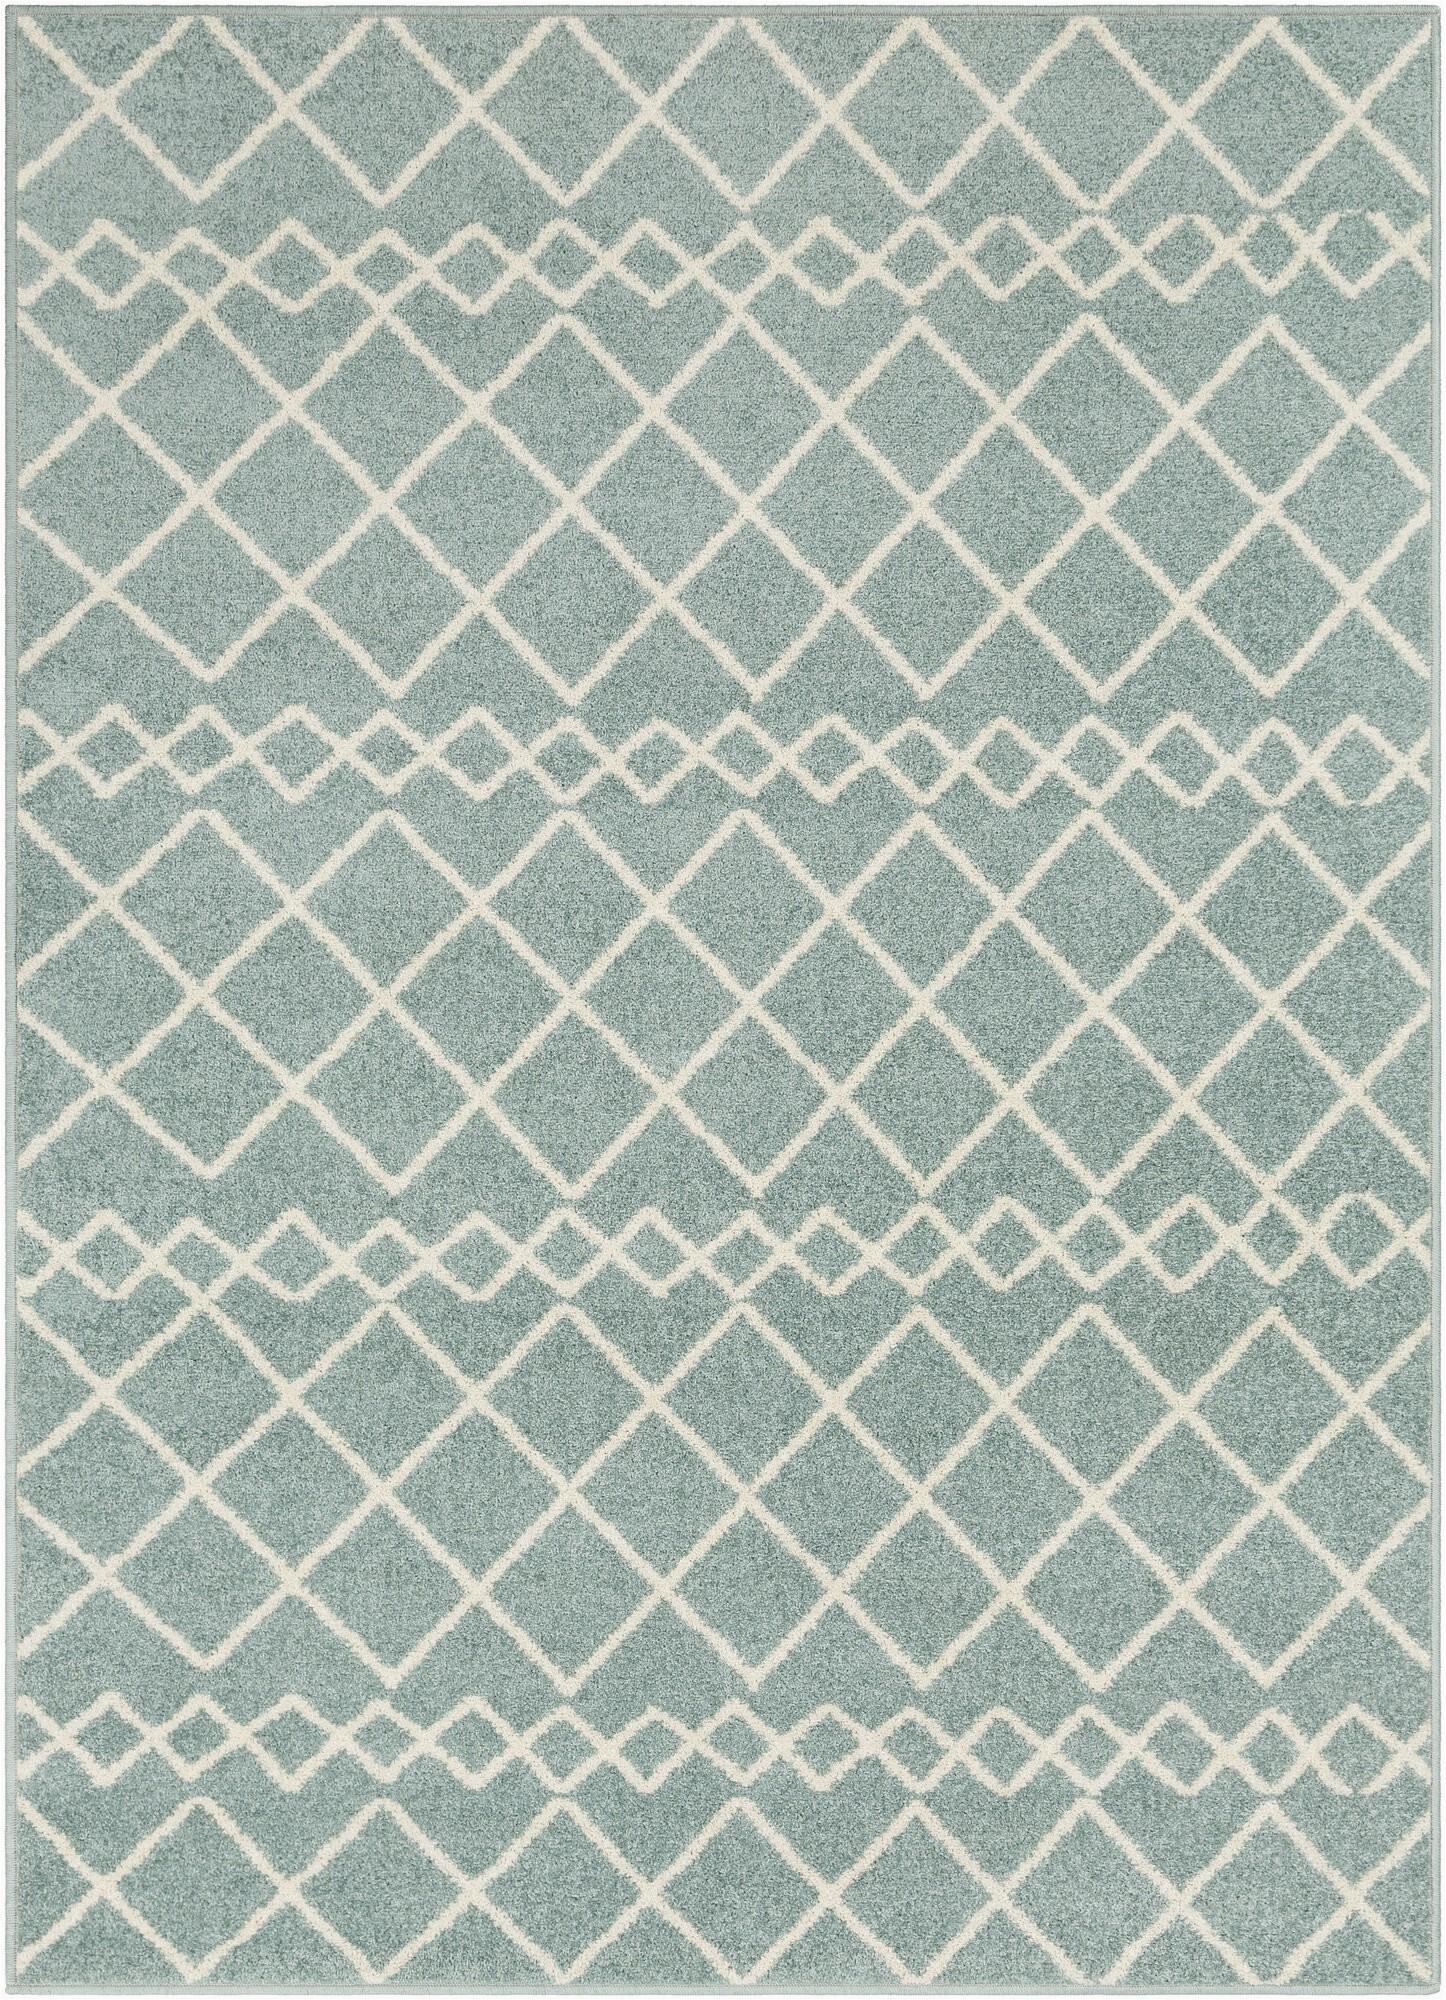 laylah geometric aquawhite area rug